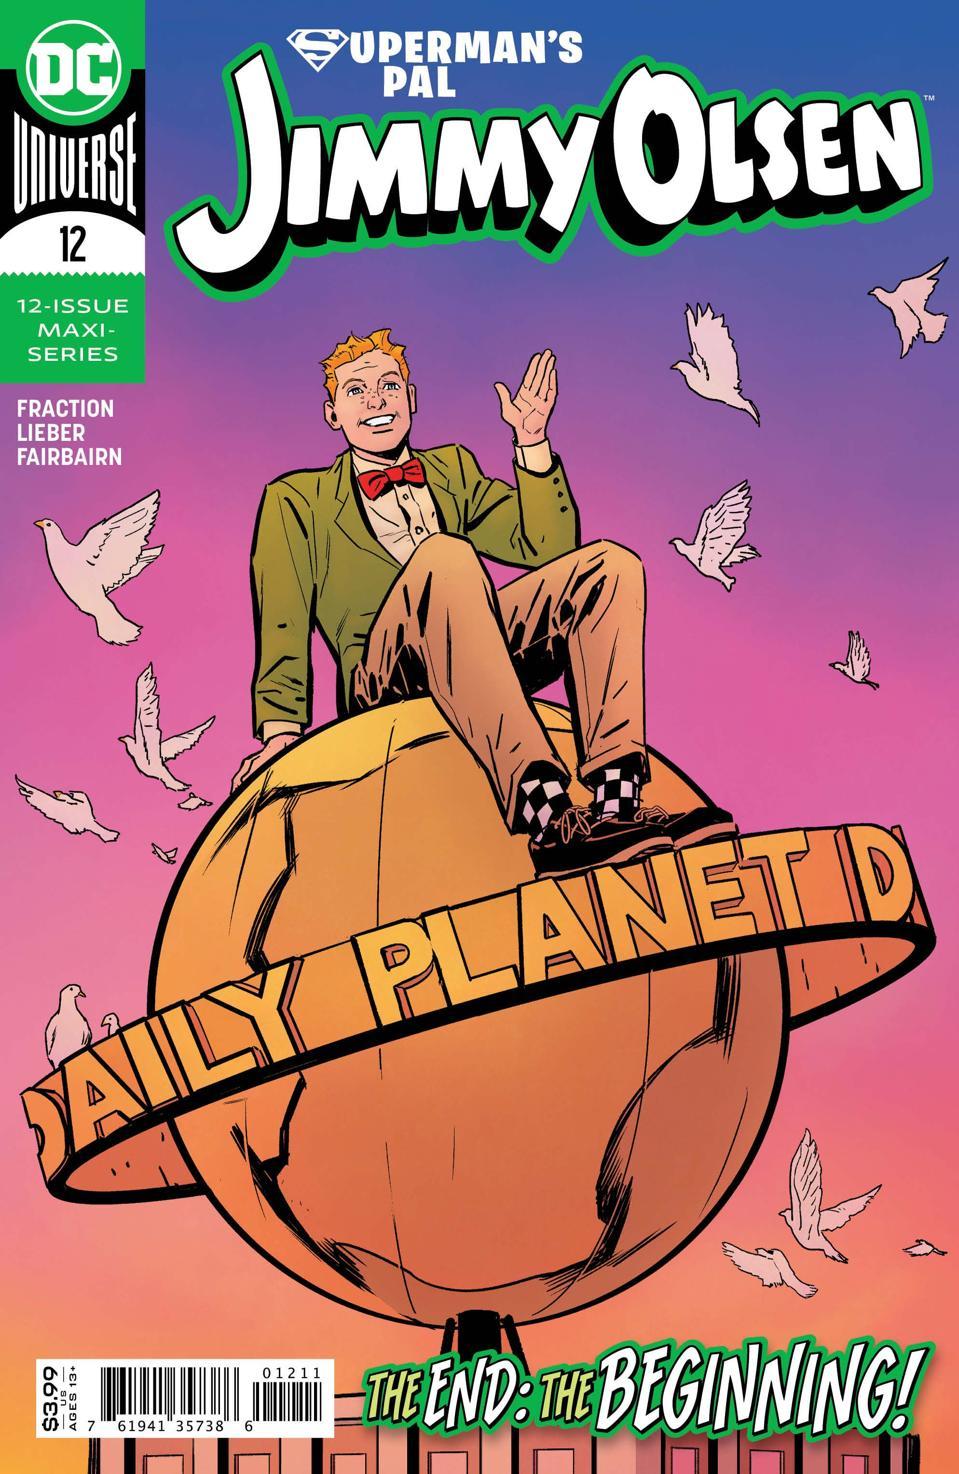 Cover of Superman's Pal Jimmy Olson Fraction Lieber humorous superhero comics 2020